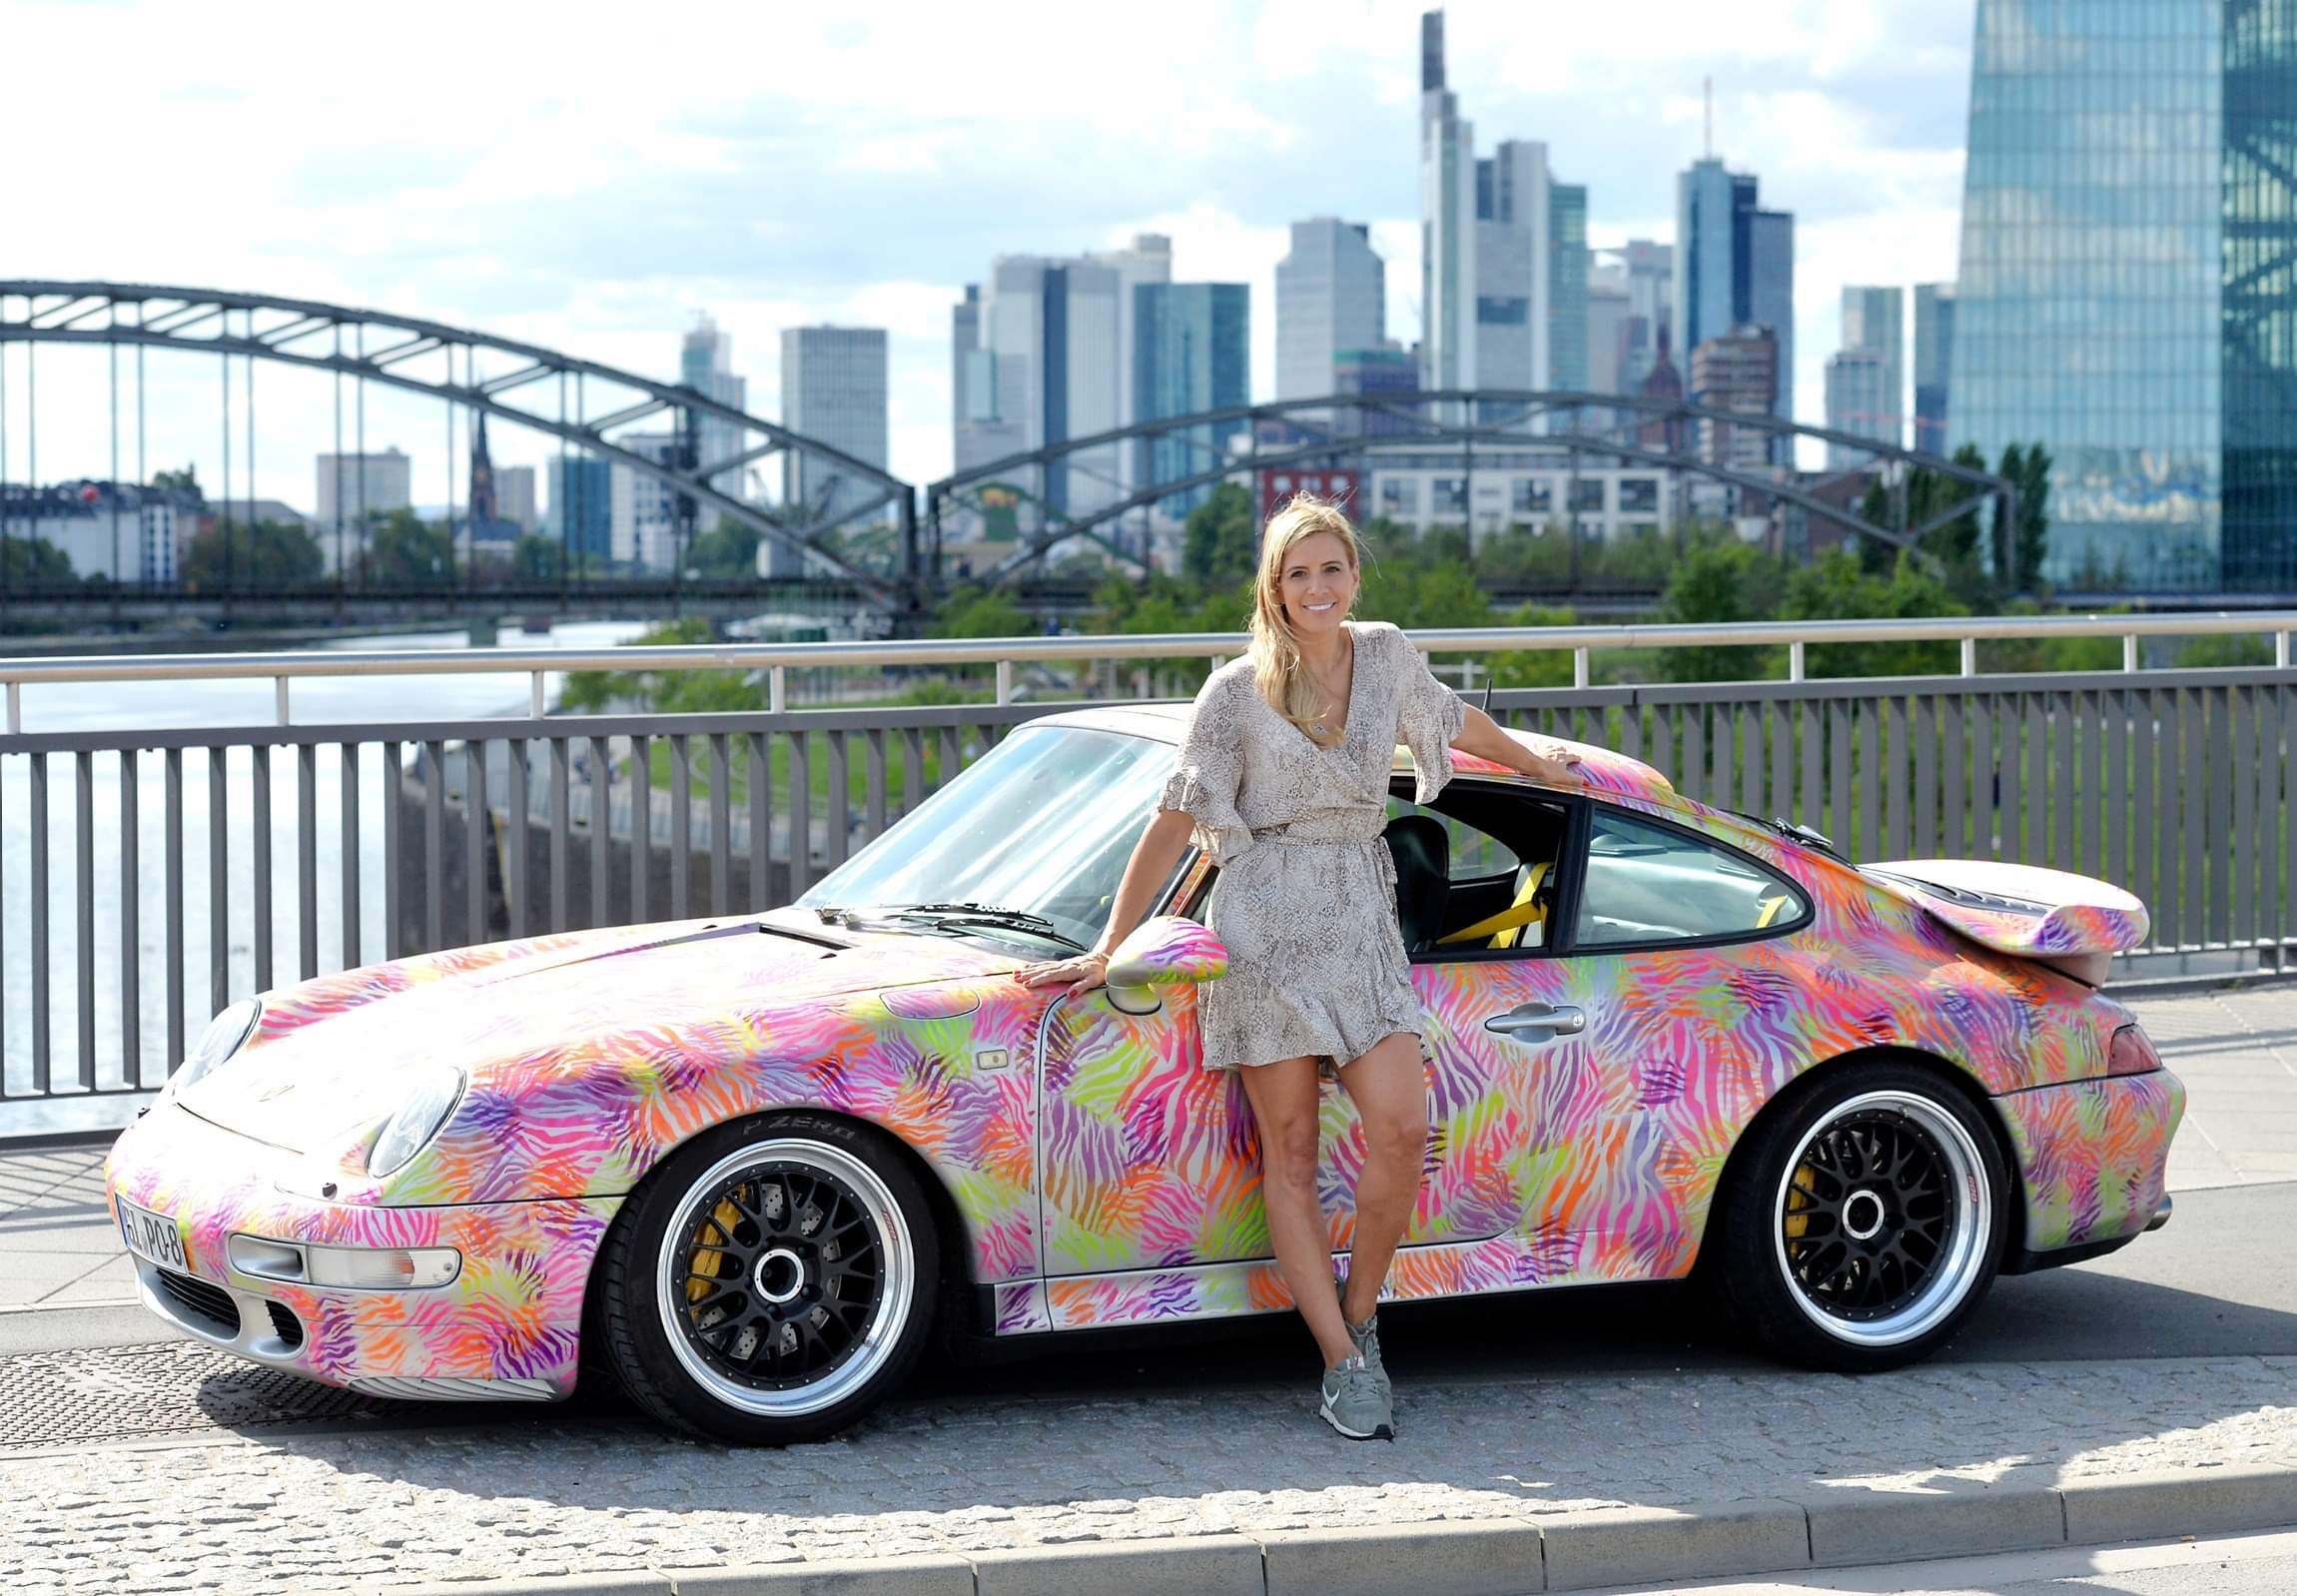 JÖRG ORTMANN, Vincenzo Marcus, Diana Eger, dianaeger, Artcar, art, Frankfurt, Porsche, 993, Popart, kunst, PorscheTurbo